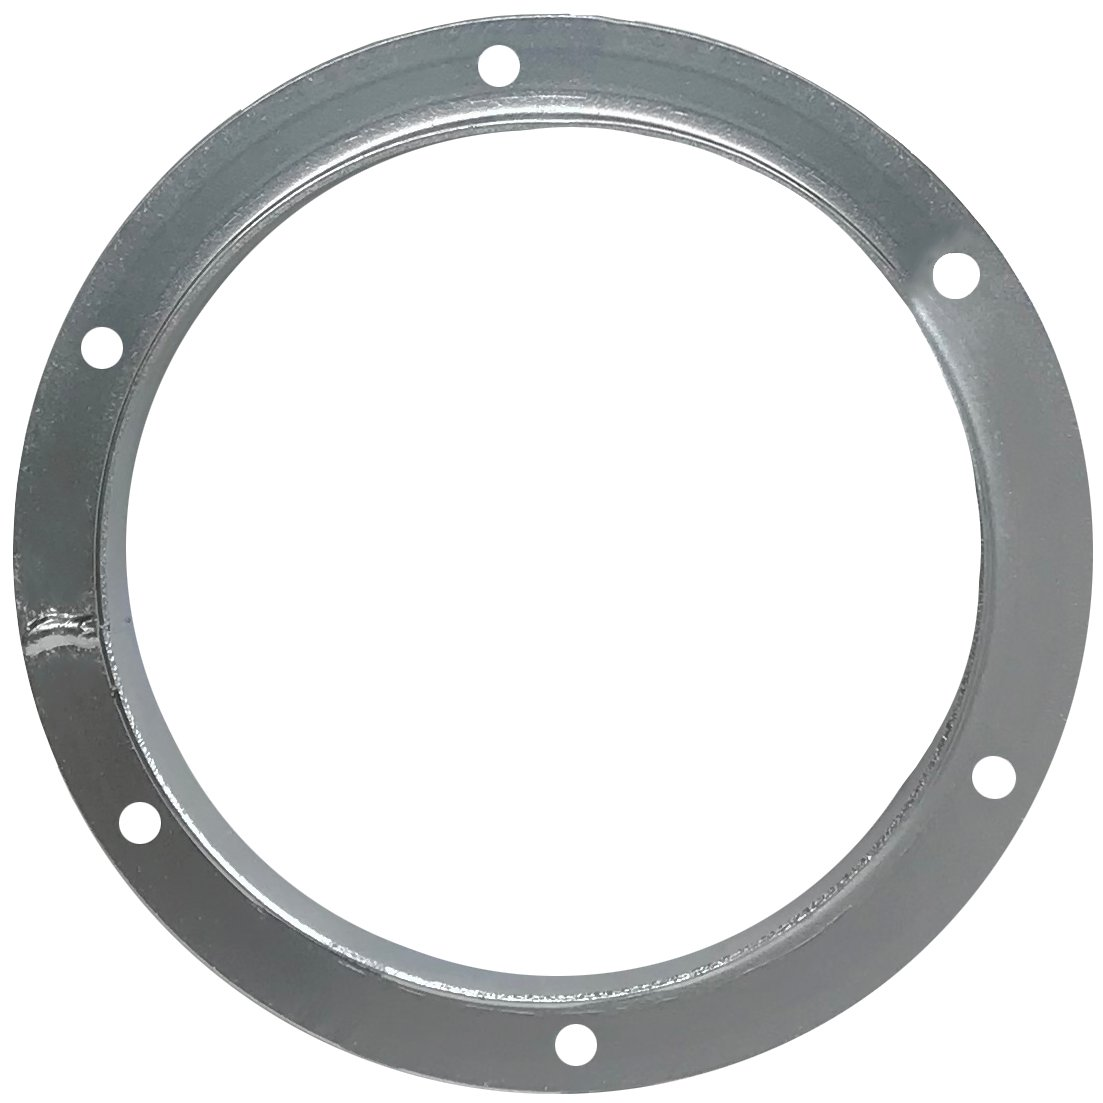 "NORDFAB 3261-1600-100000 Angle Flange Galvanized Steel 20 GA, 16/"" Duct Dia"